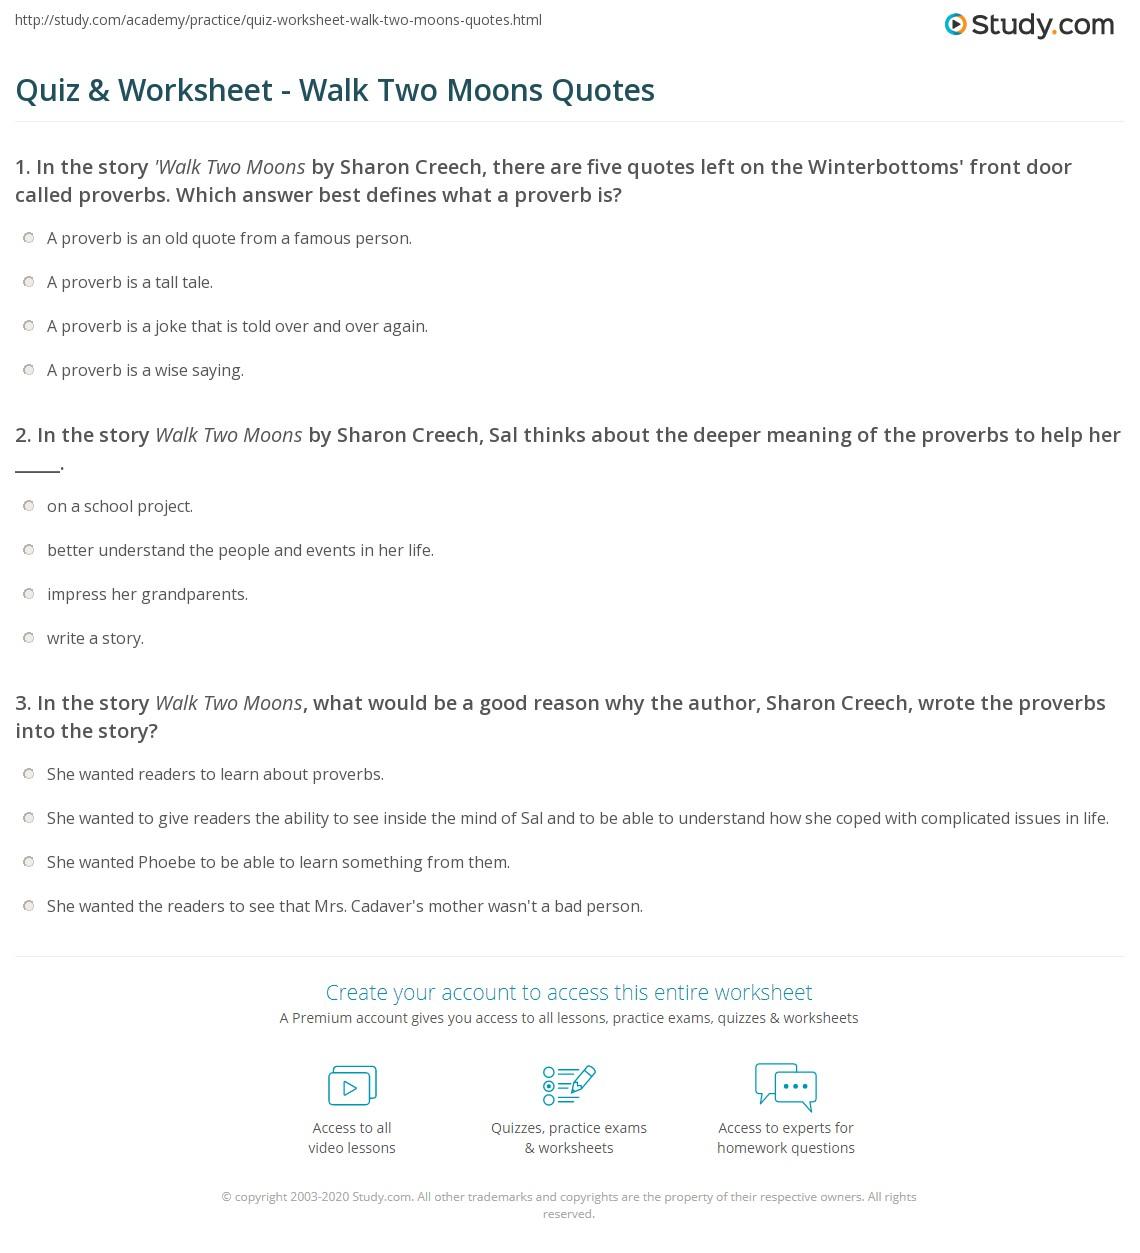 Quiz & Worksheet - Walk Two Moons Quotes | Study.com